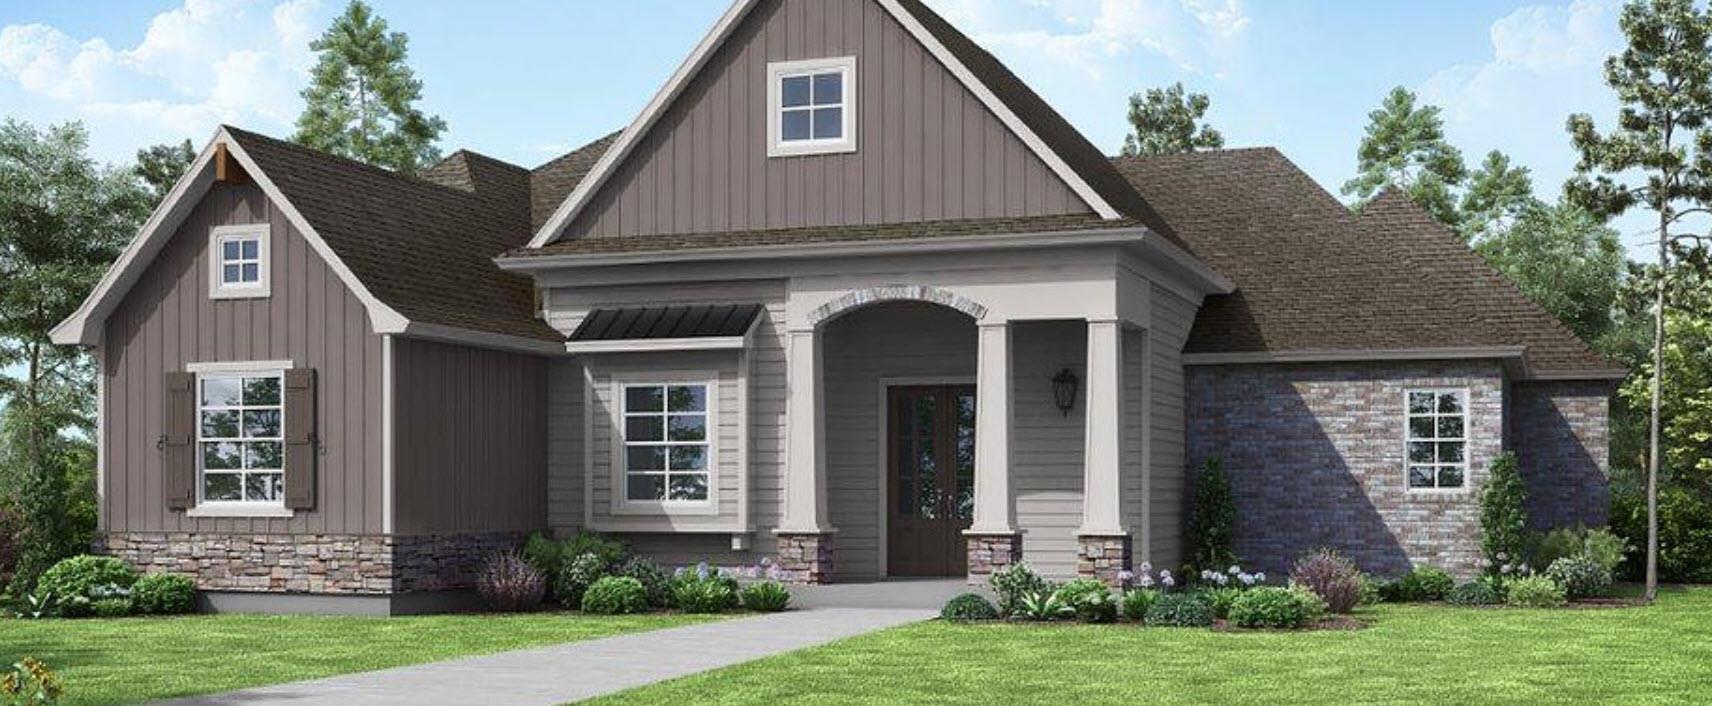 Custom Home 44:Elevation